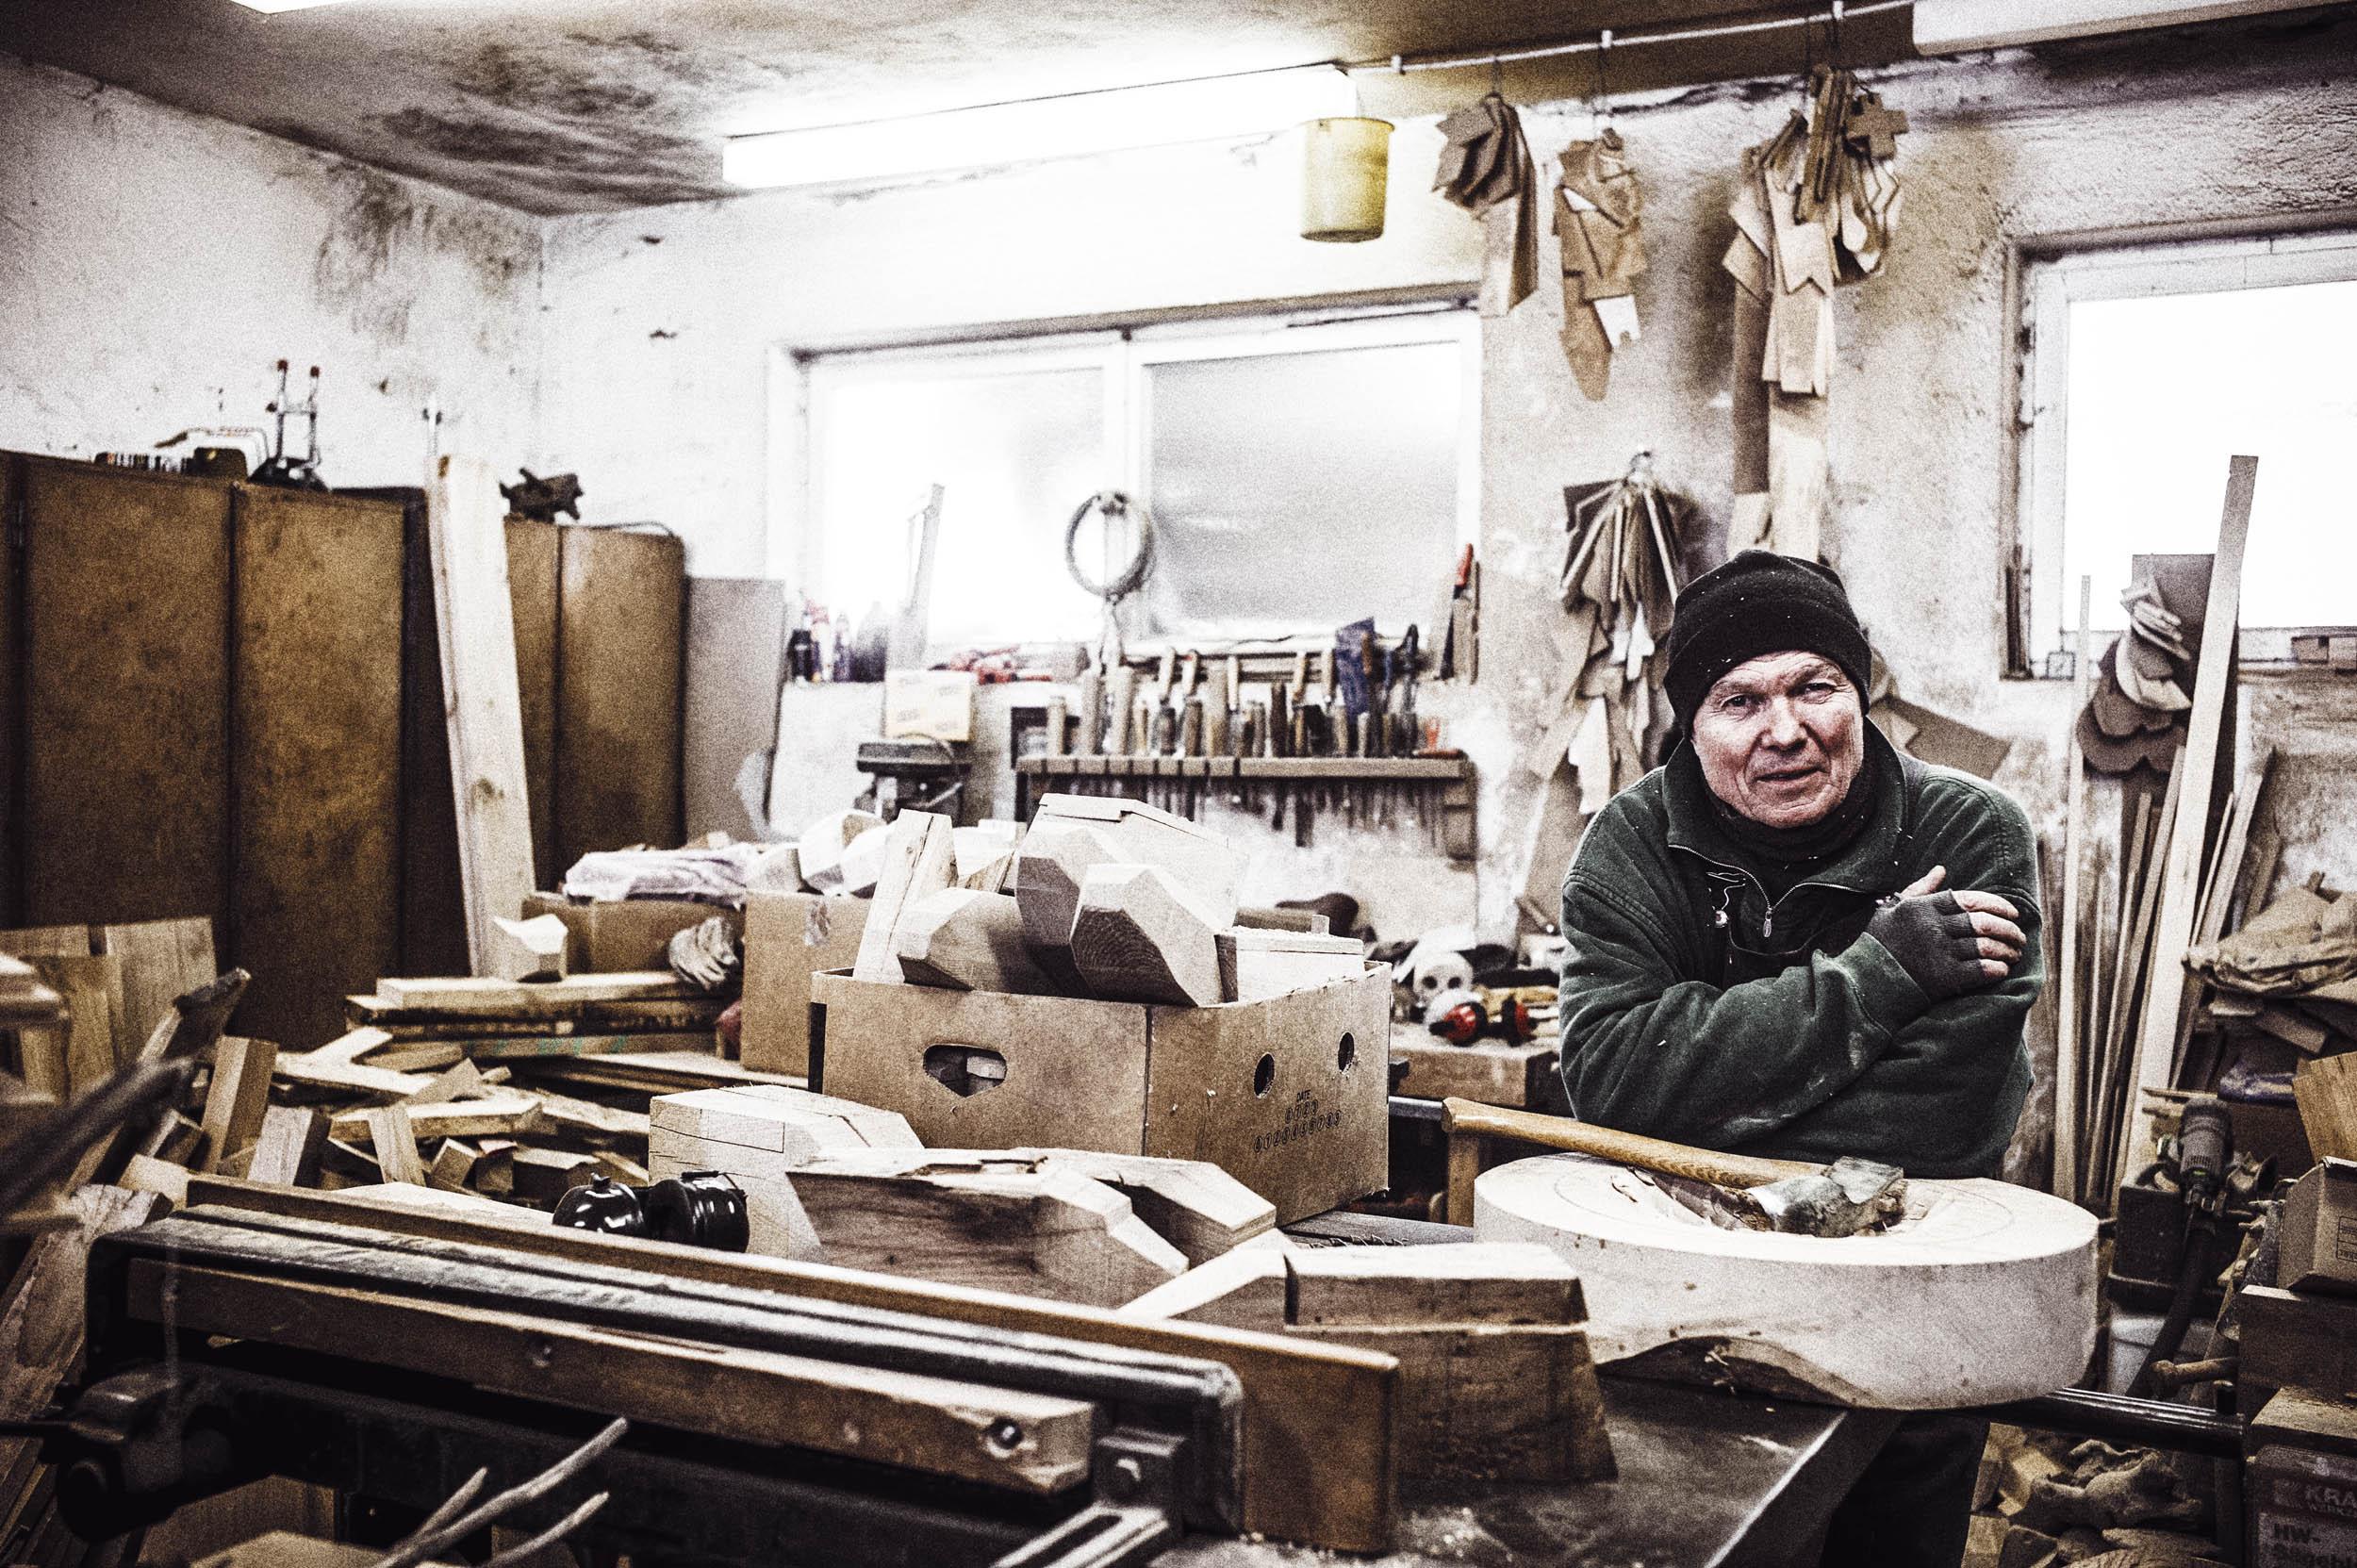 seifertuebler-corporate-handcraft-woodsculpture-vogel-11.jpg